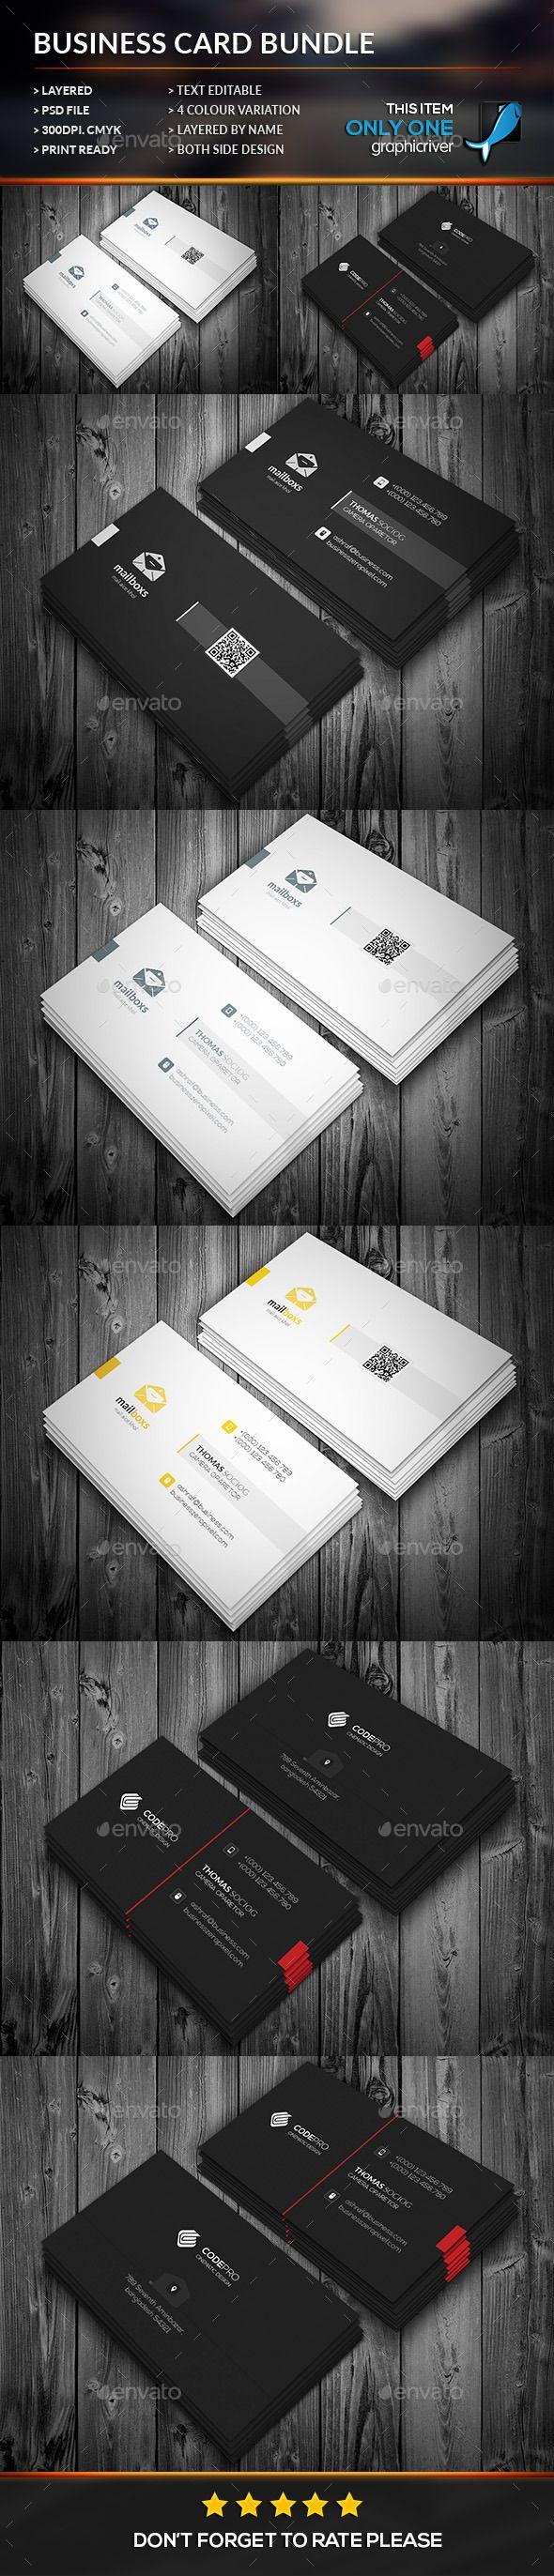 Simply Business Card Bundle Template #design Download: http://graphicriver.net/item/simply-business-card-bundle/12129885?ref=ksioks